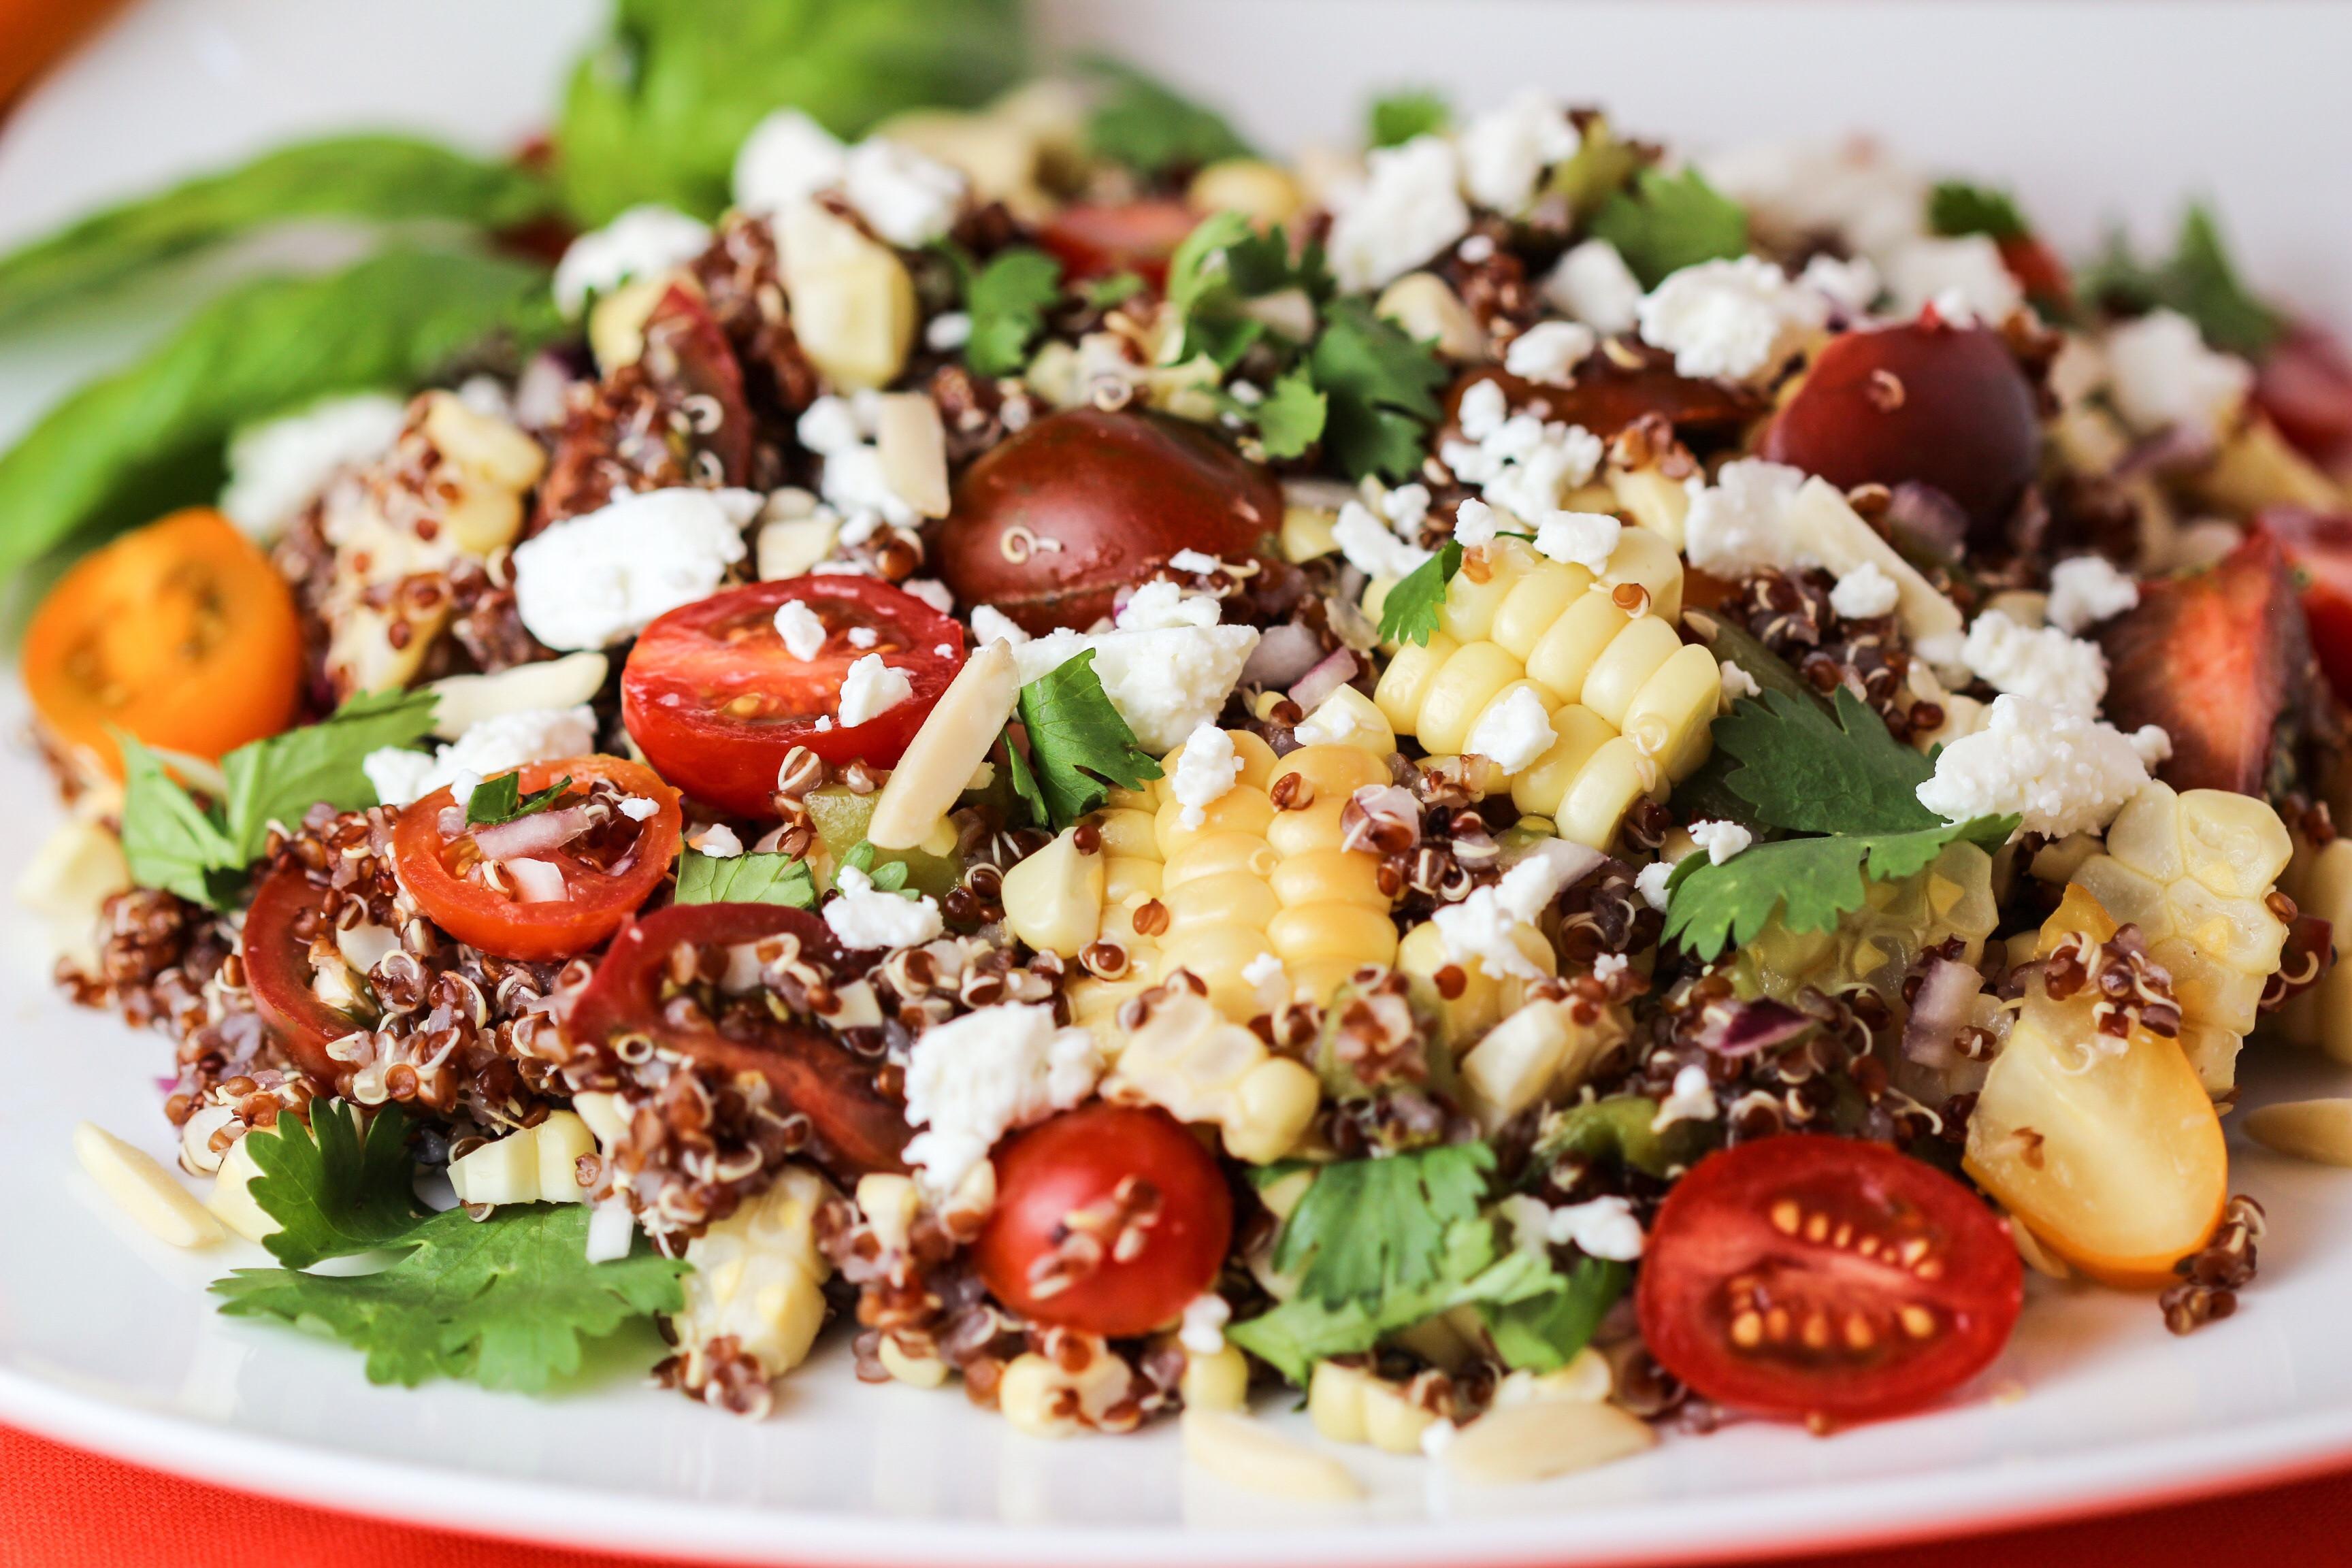 Quinoa Salad Feta  Roasted Red Pepper And Feta Quinoa Salad Recipe — Dishmaps